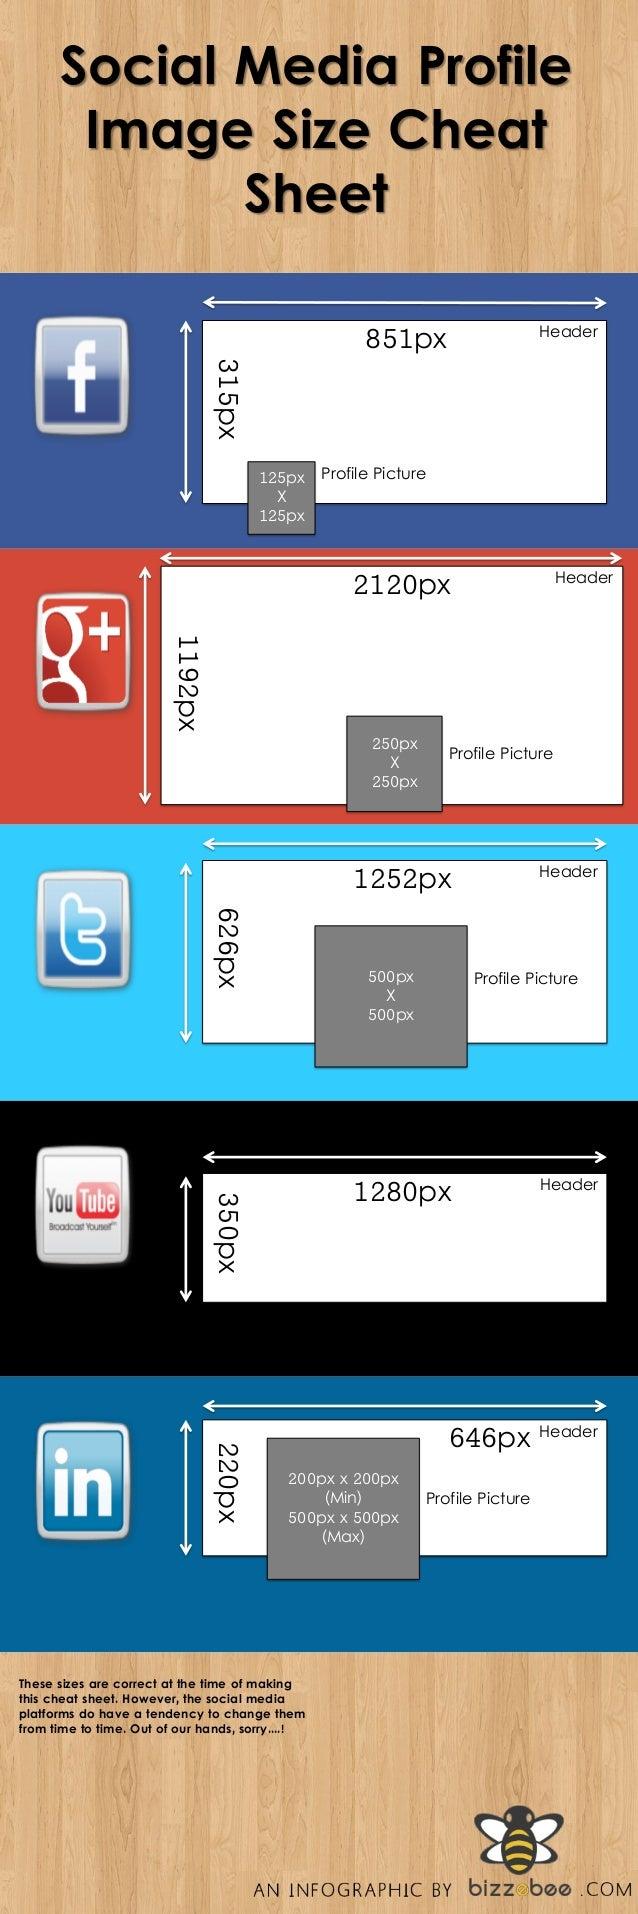 Social Media Profile Image Size Cheat Sheet 315px  851px  Header  125 X 125 125px X 125px  Profile Picture  2120px  Header...